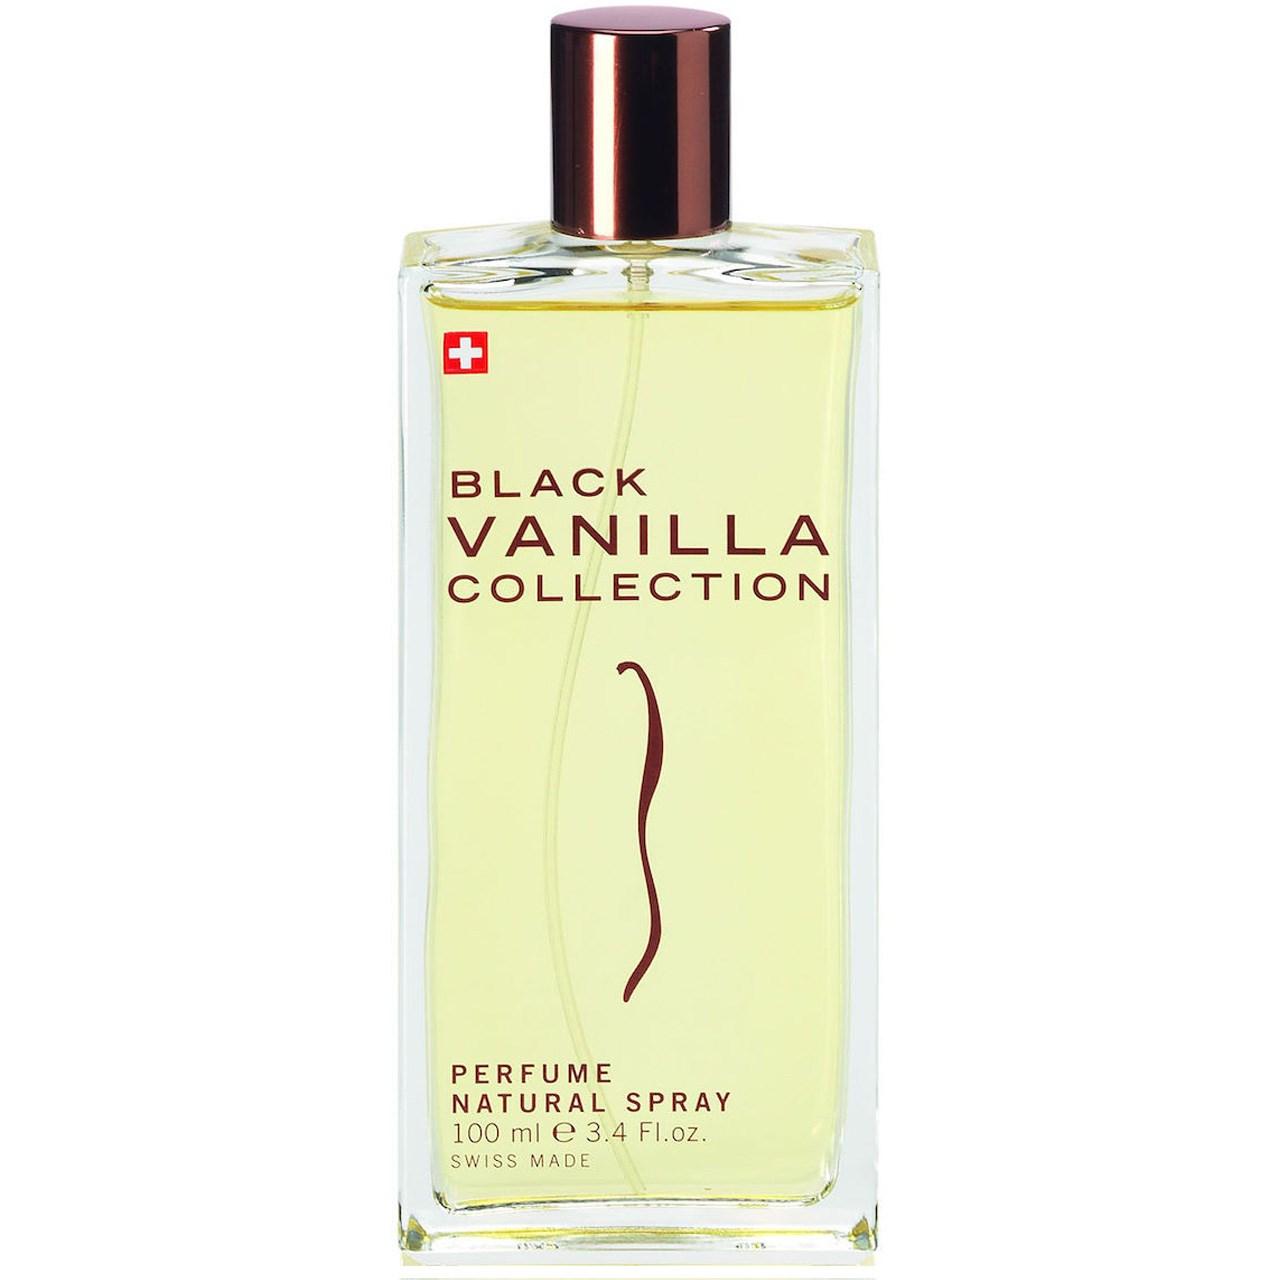 قیمت ادو پرفیوم ماسک کالکشن استاویتا مدل Black Vanilla حجم 100 میلی لیتر